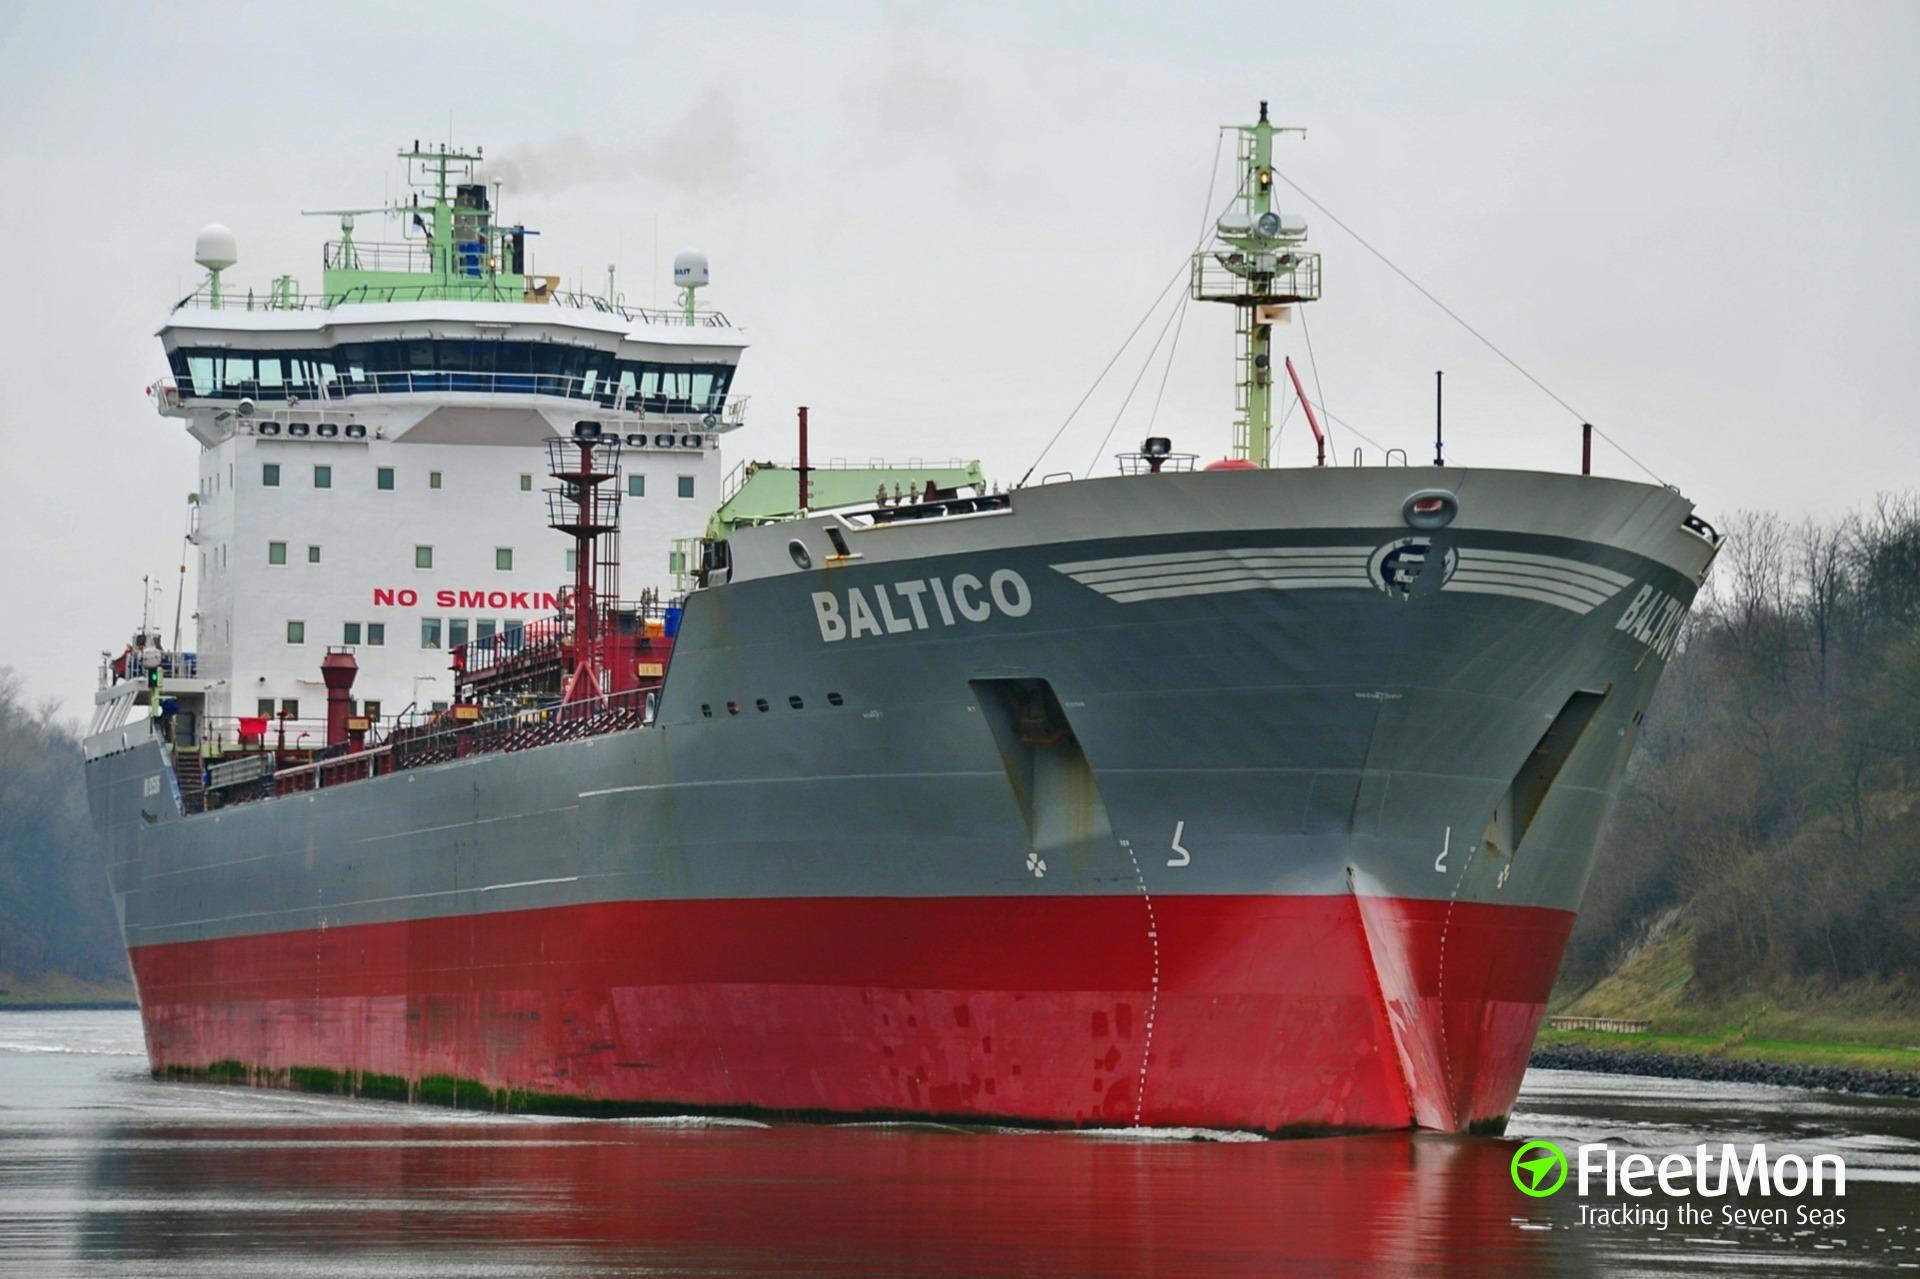 Tanker suffered fire, one crew injured, Denmark